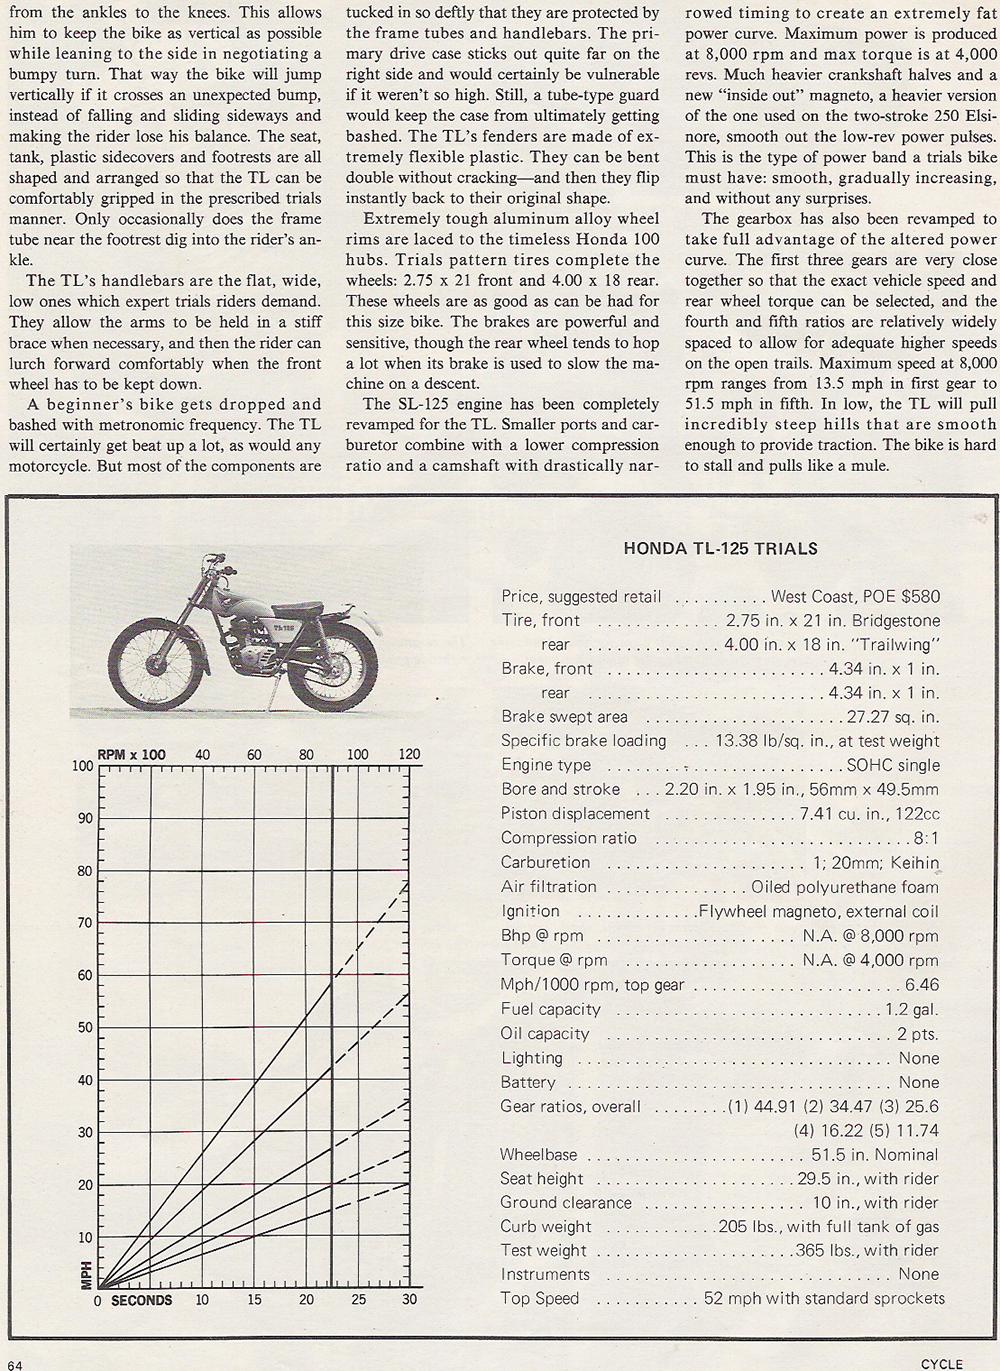 1973_Honda_TL-125_roadtest_pg4.png